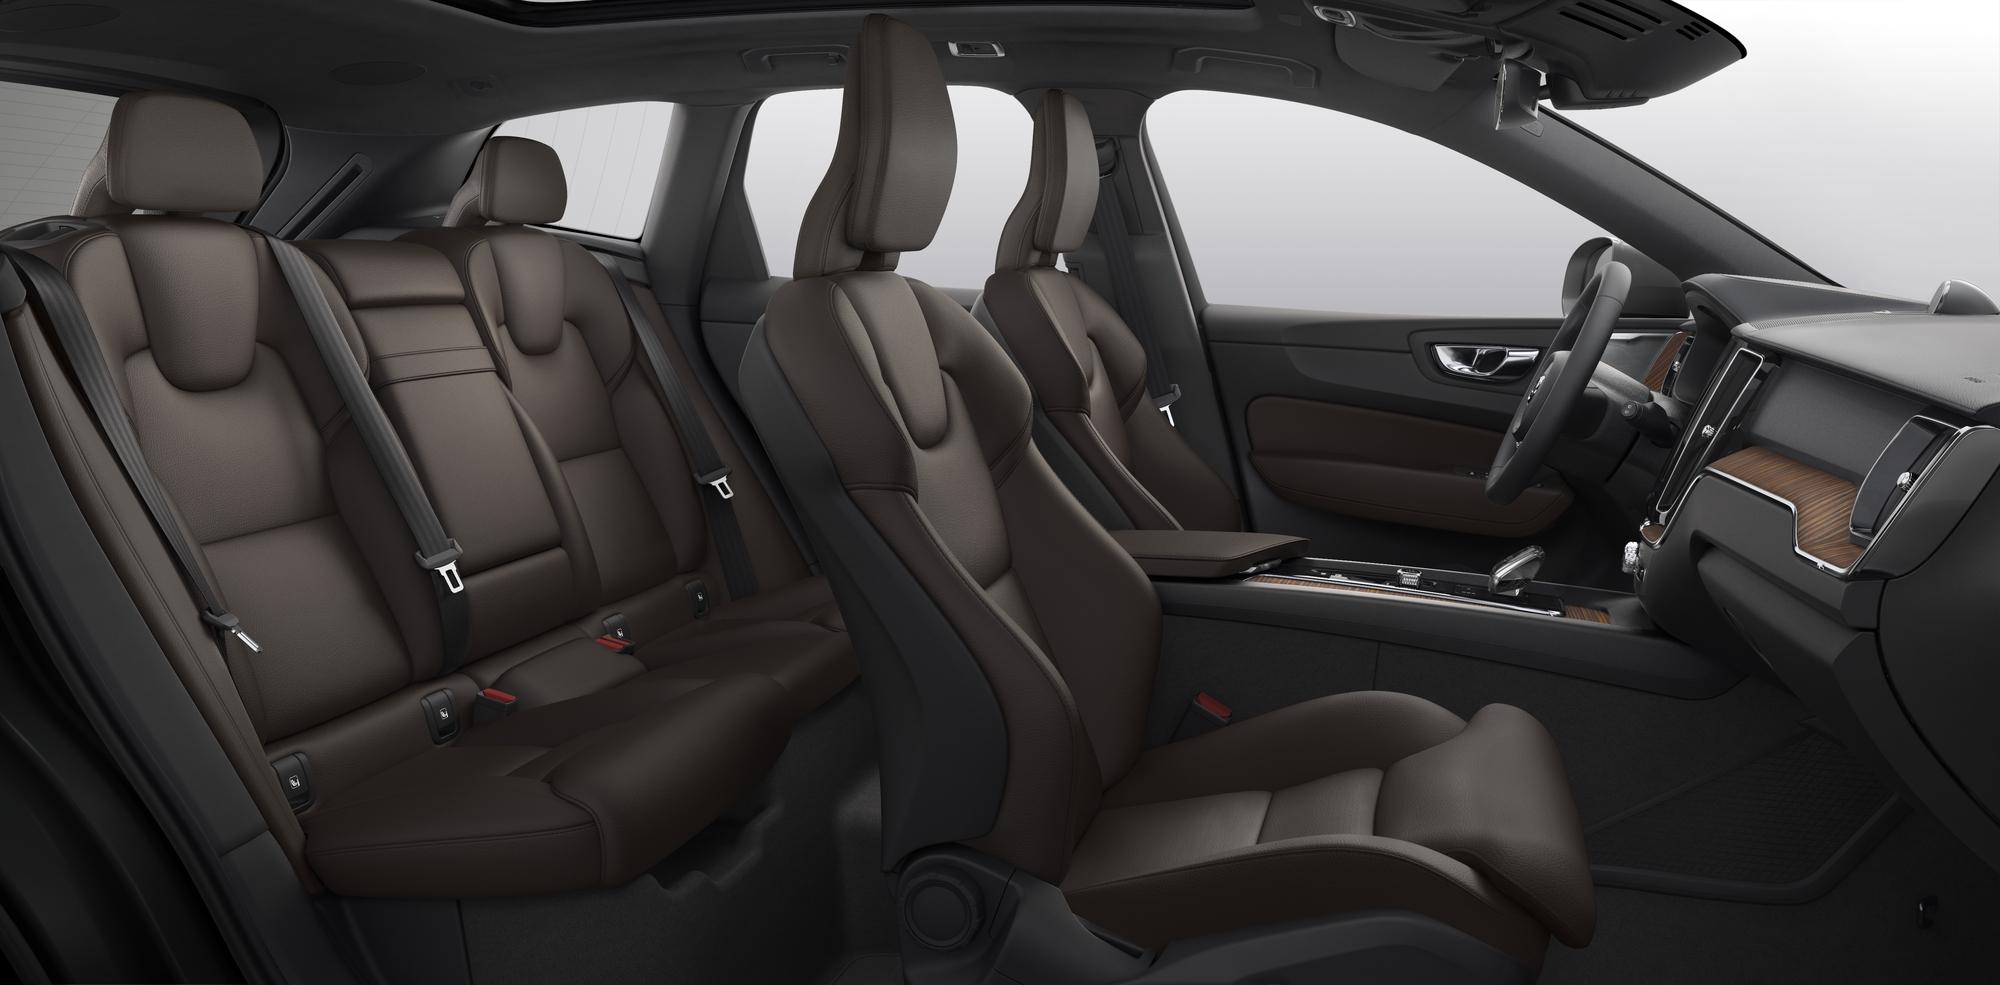 Volvo ХС60 ua  фото интерьера 4